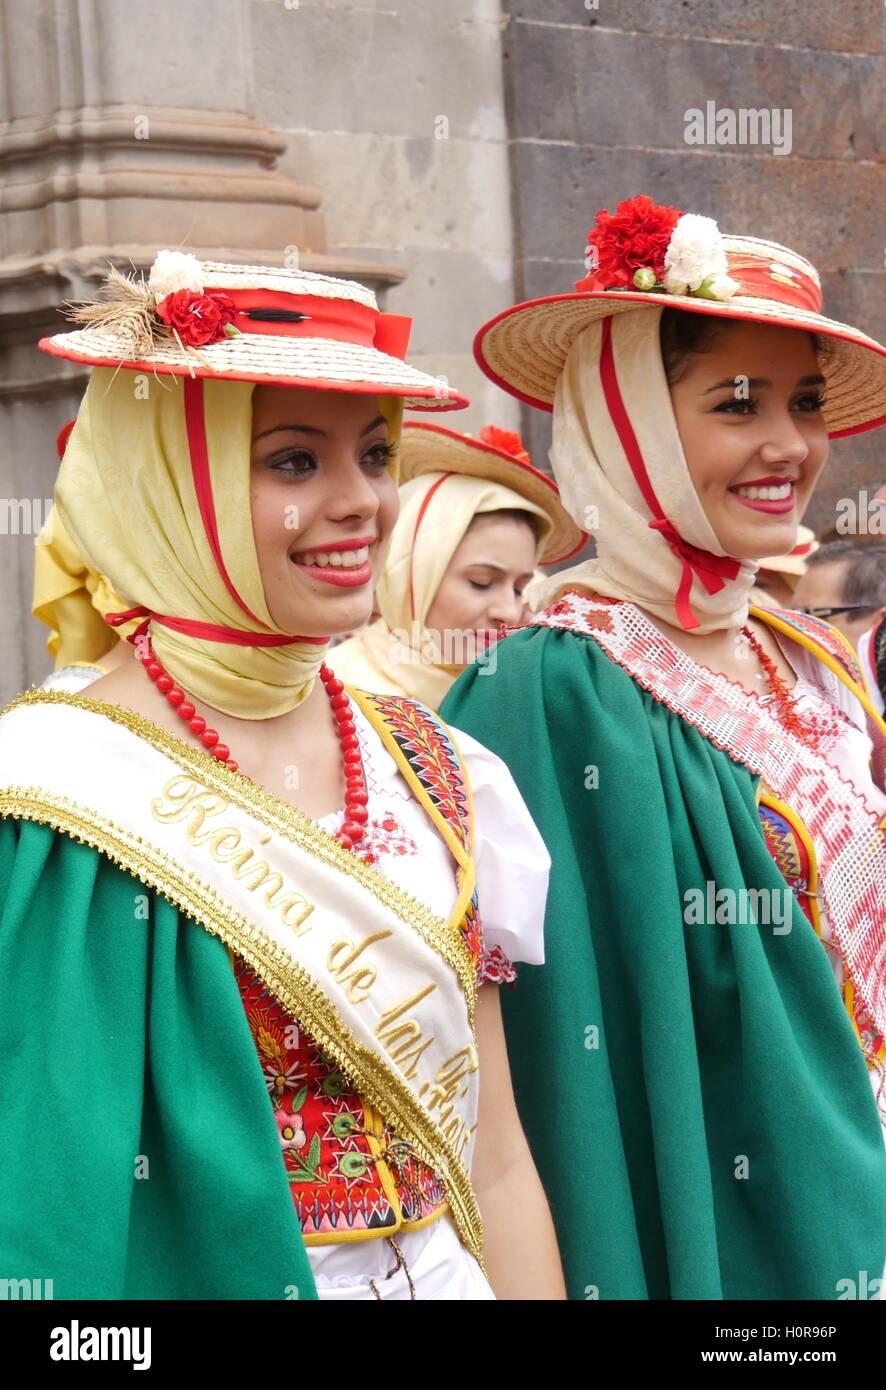 Romera Bürgermeister - Ana Méndez Rodríguez (rechts), Reina de Las Fiestas del Corpus - Eva Farrais Stockbild